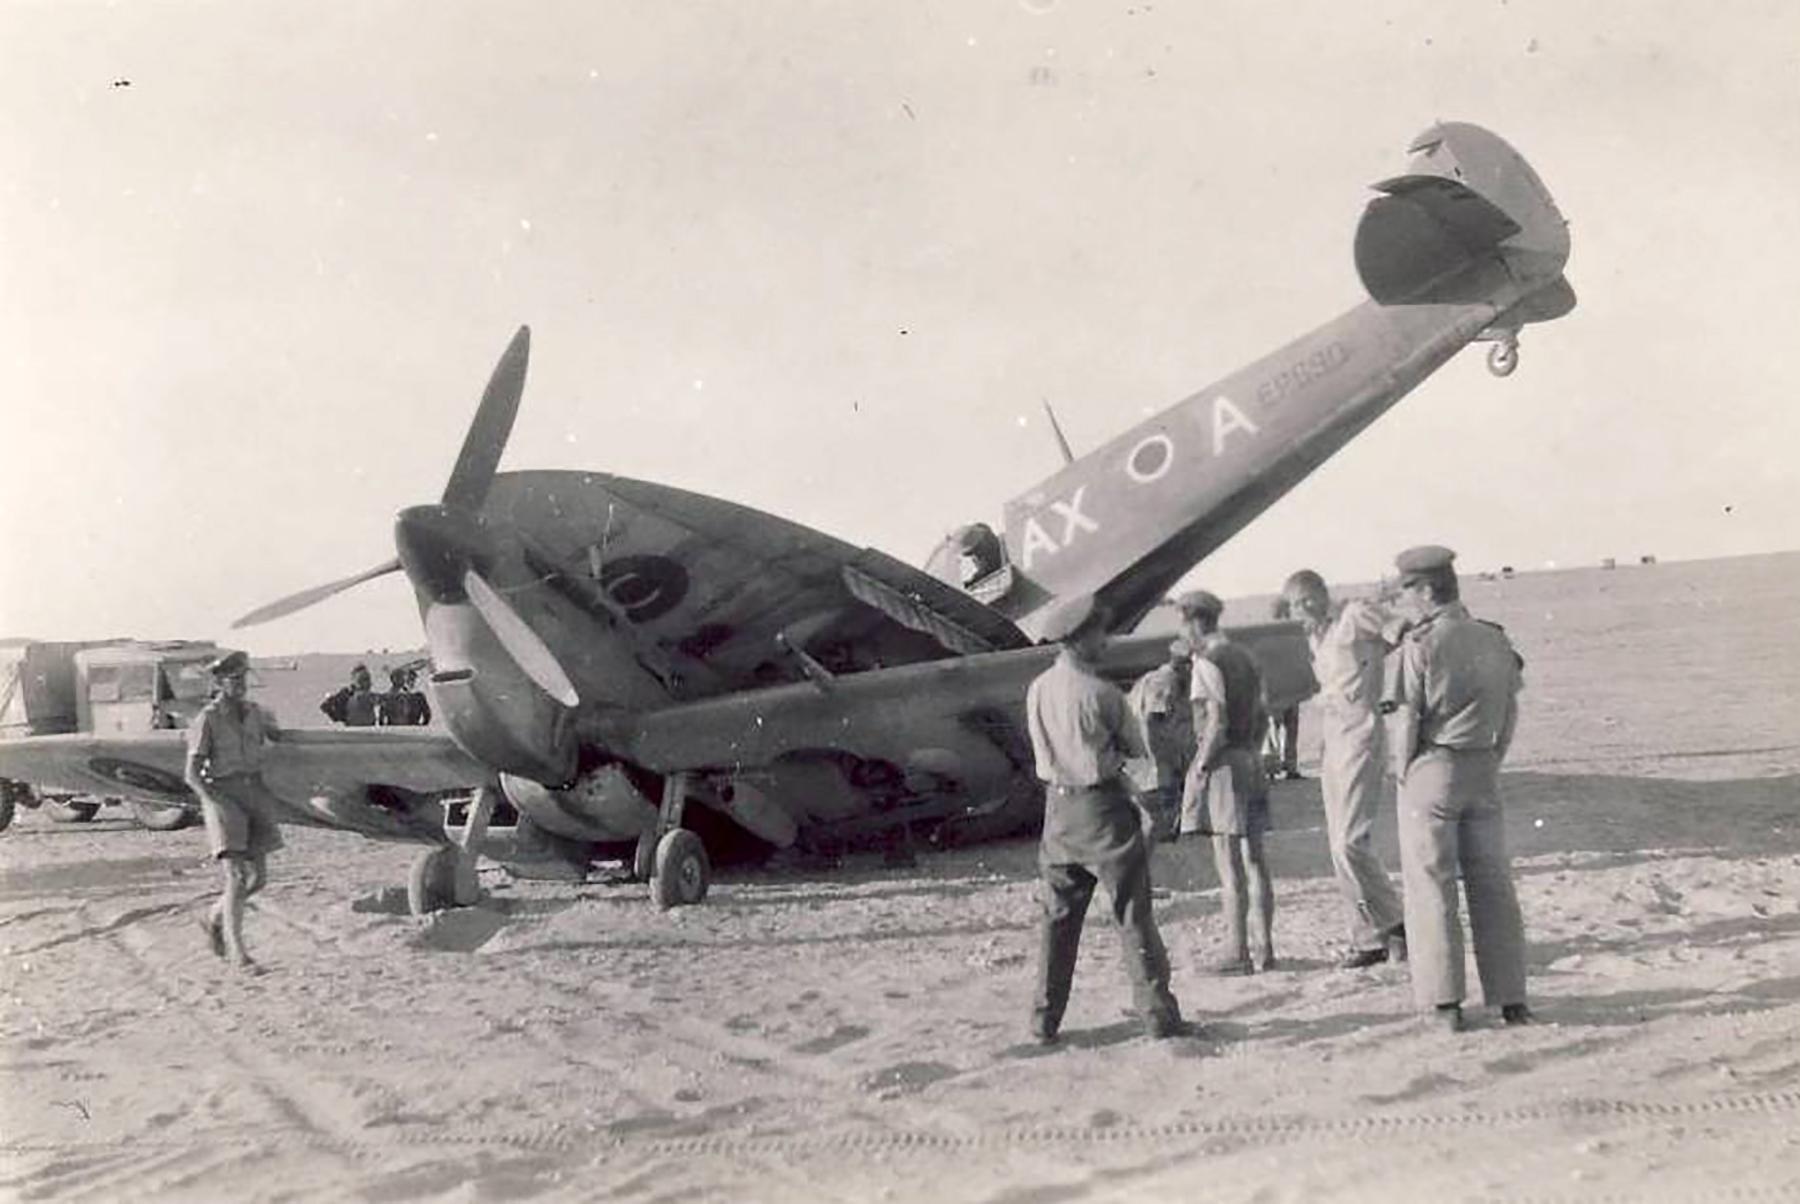 Spitfire MkVbTrop SAAF 1Sqn AXA EP690 landing accident El Hasseiat 4th Dec 1942 01